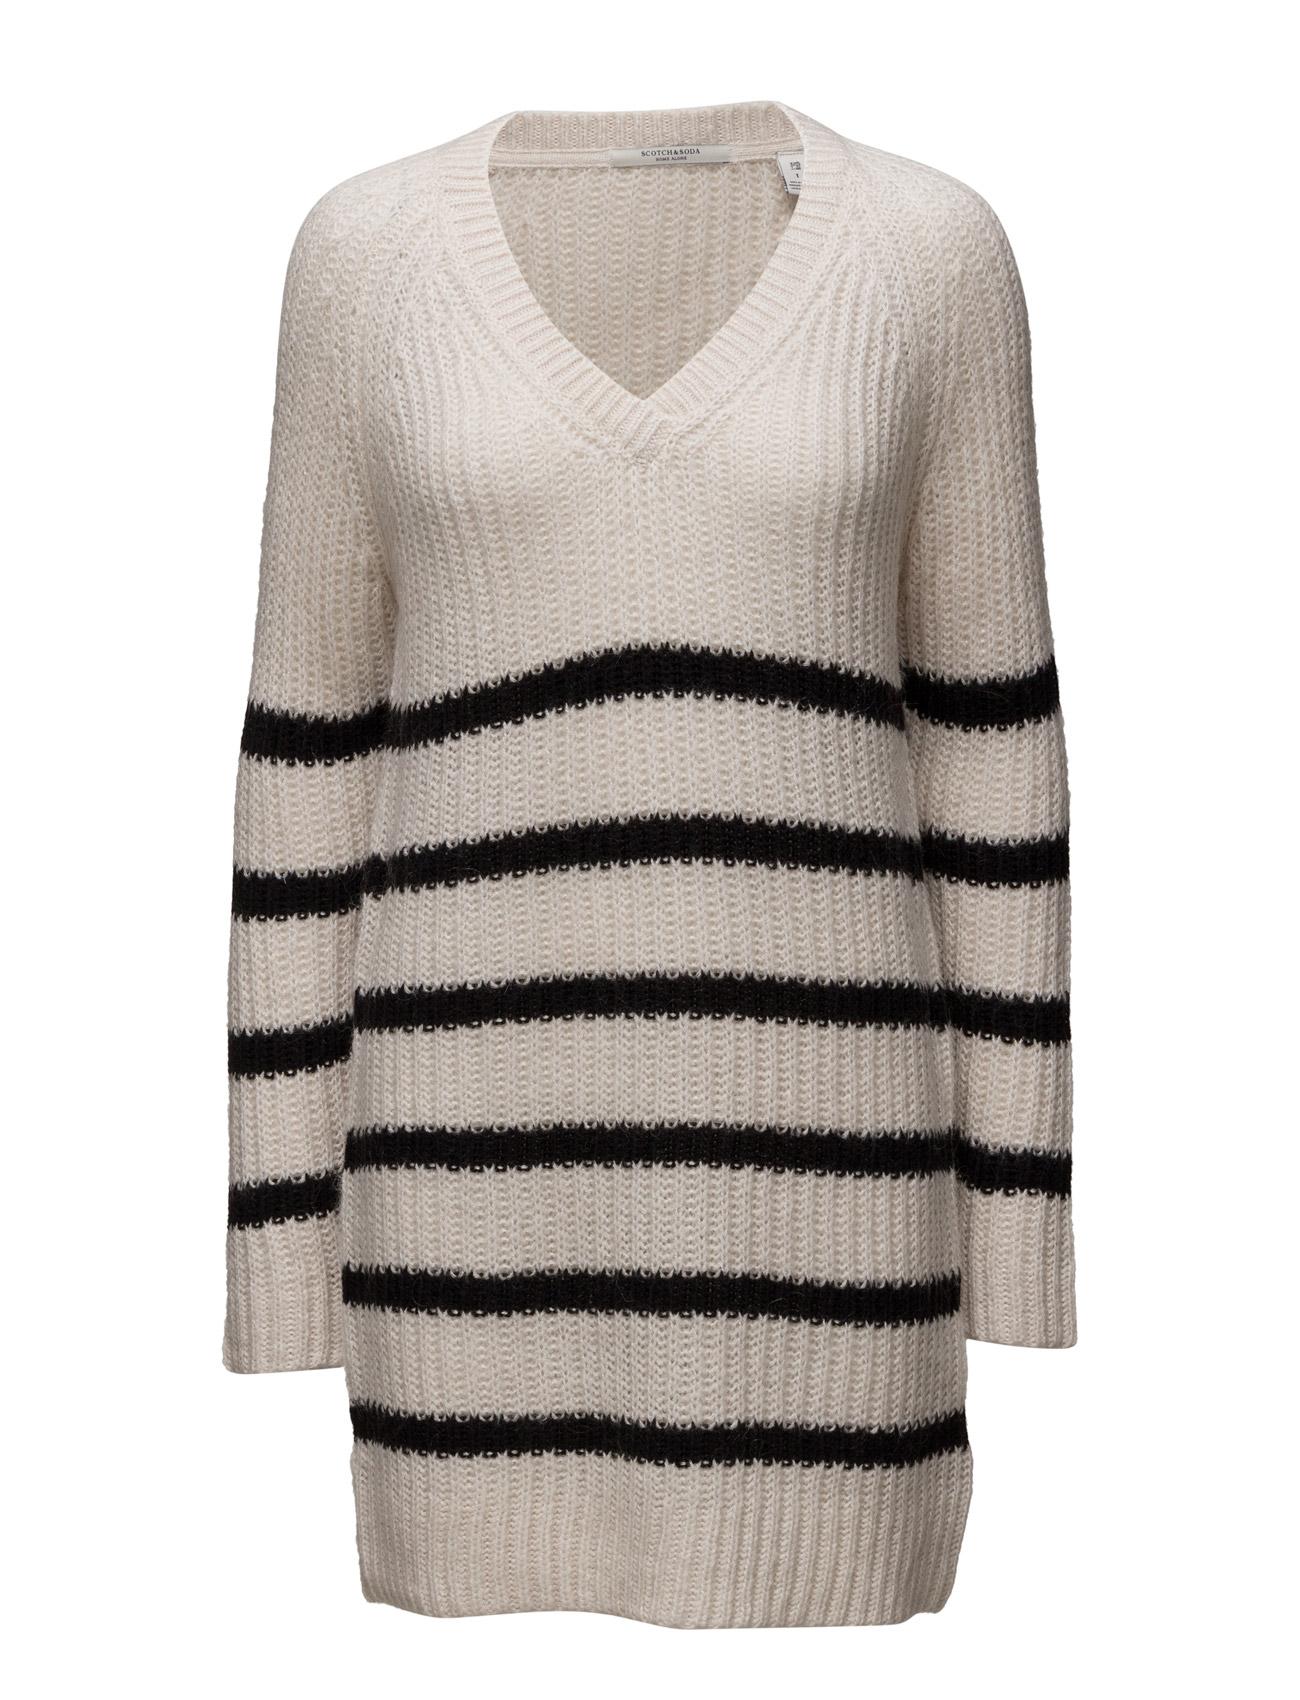 Home Alone Oversized V-Neck Hairy Striped Knit Scotch & Soda Sweatshirts til Damer i